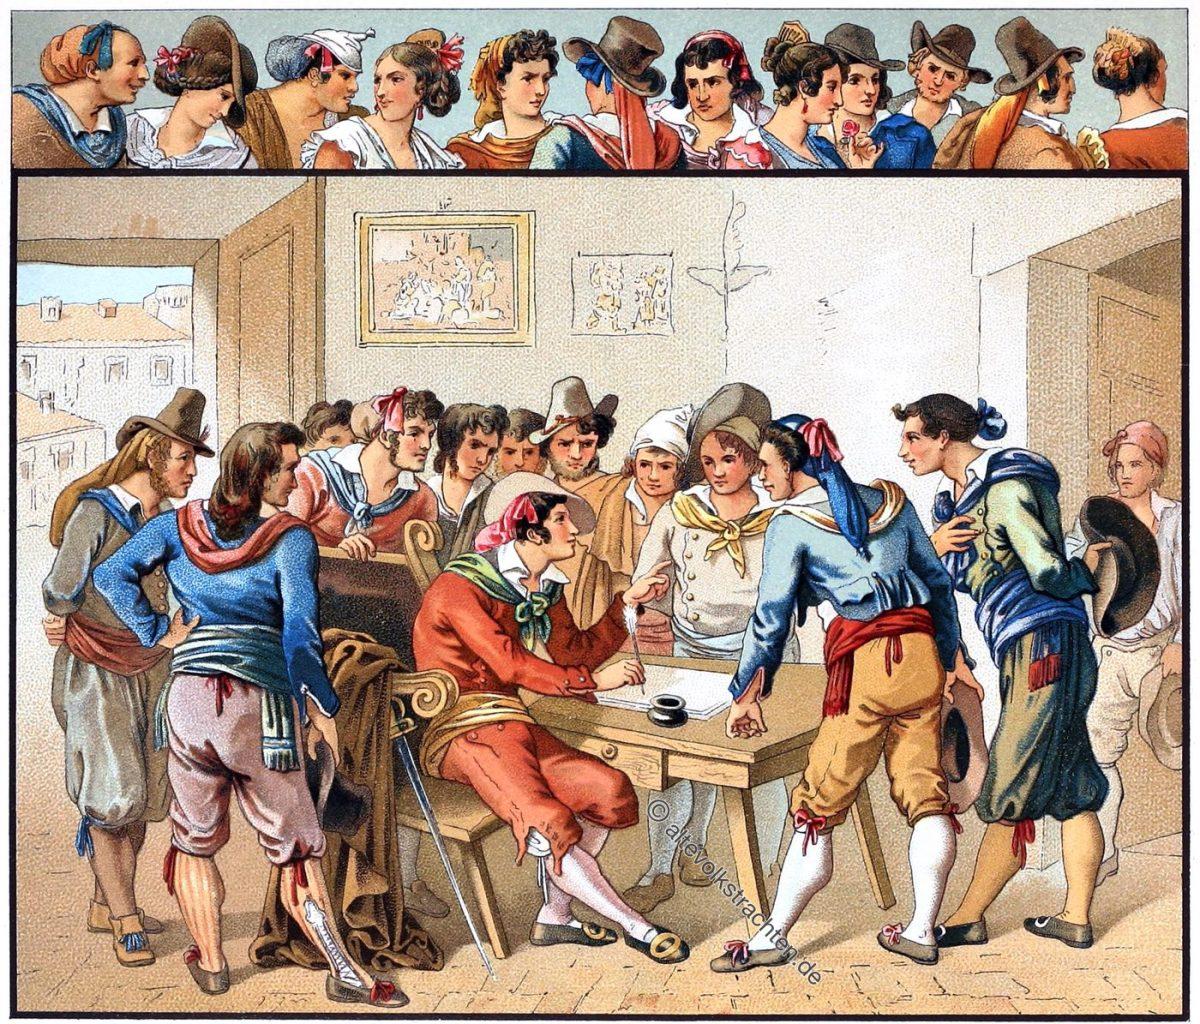 Italien, Volkstrachten, Trastevere, Rom, Römer, Trachten, Kostüme, Auguste Racinet,